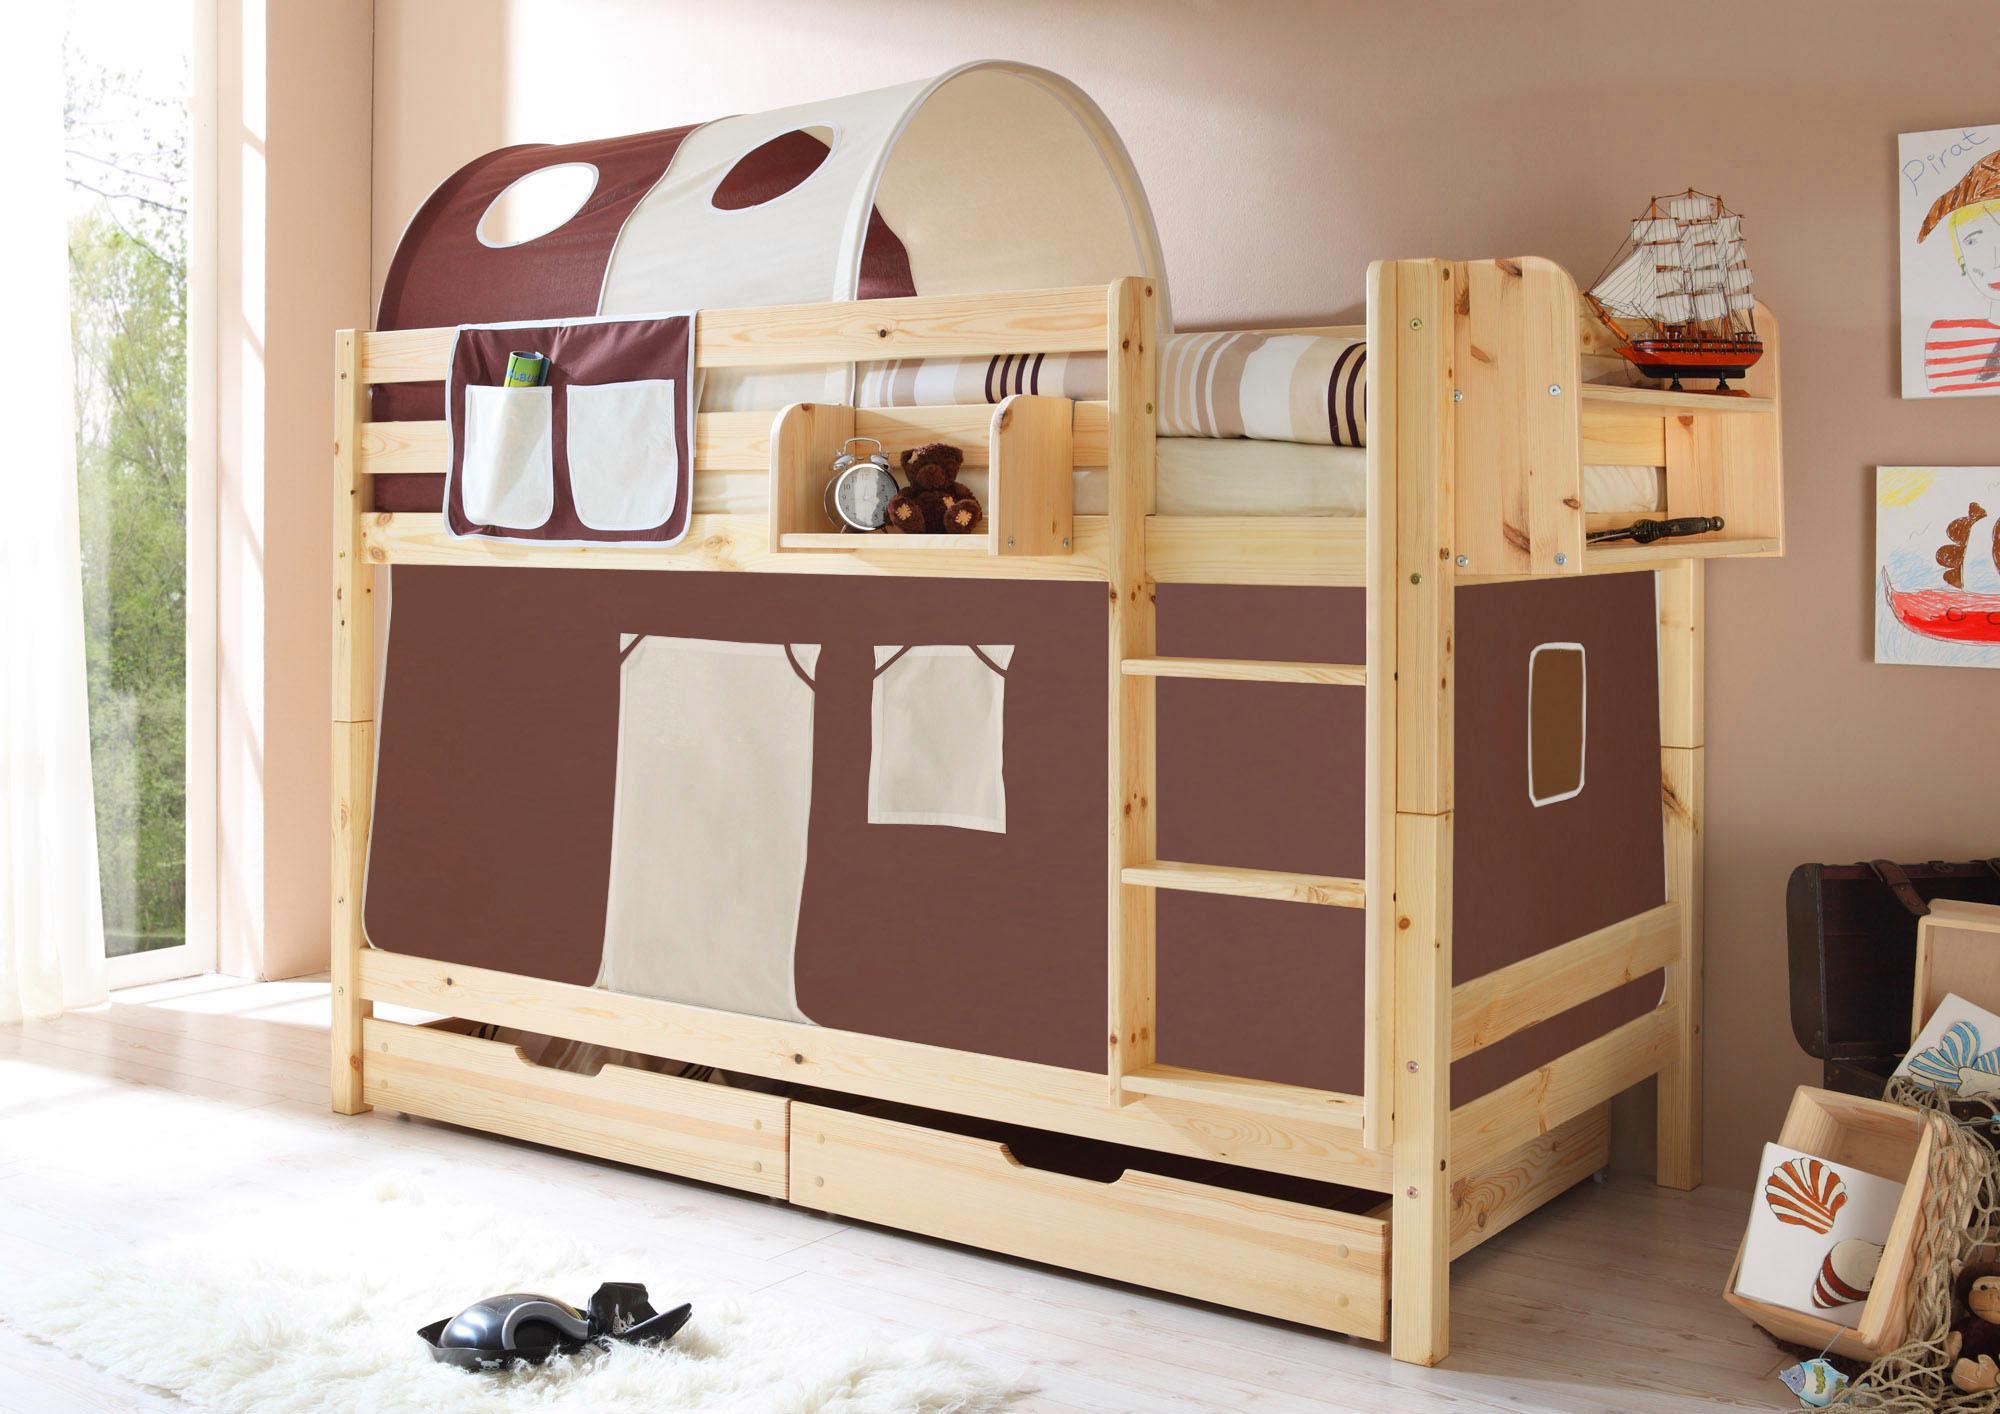 Etagenbett Tica : Ticaa einzel etagenbett »marcel« mit textil set kiefer massiv